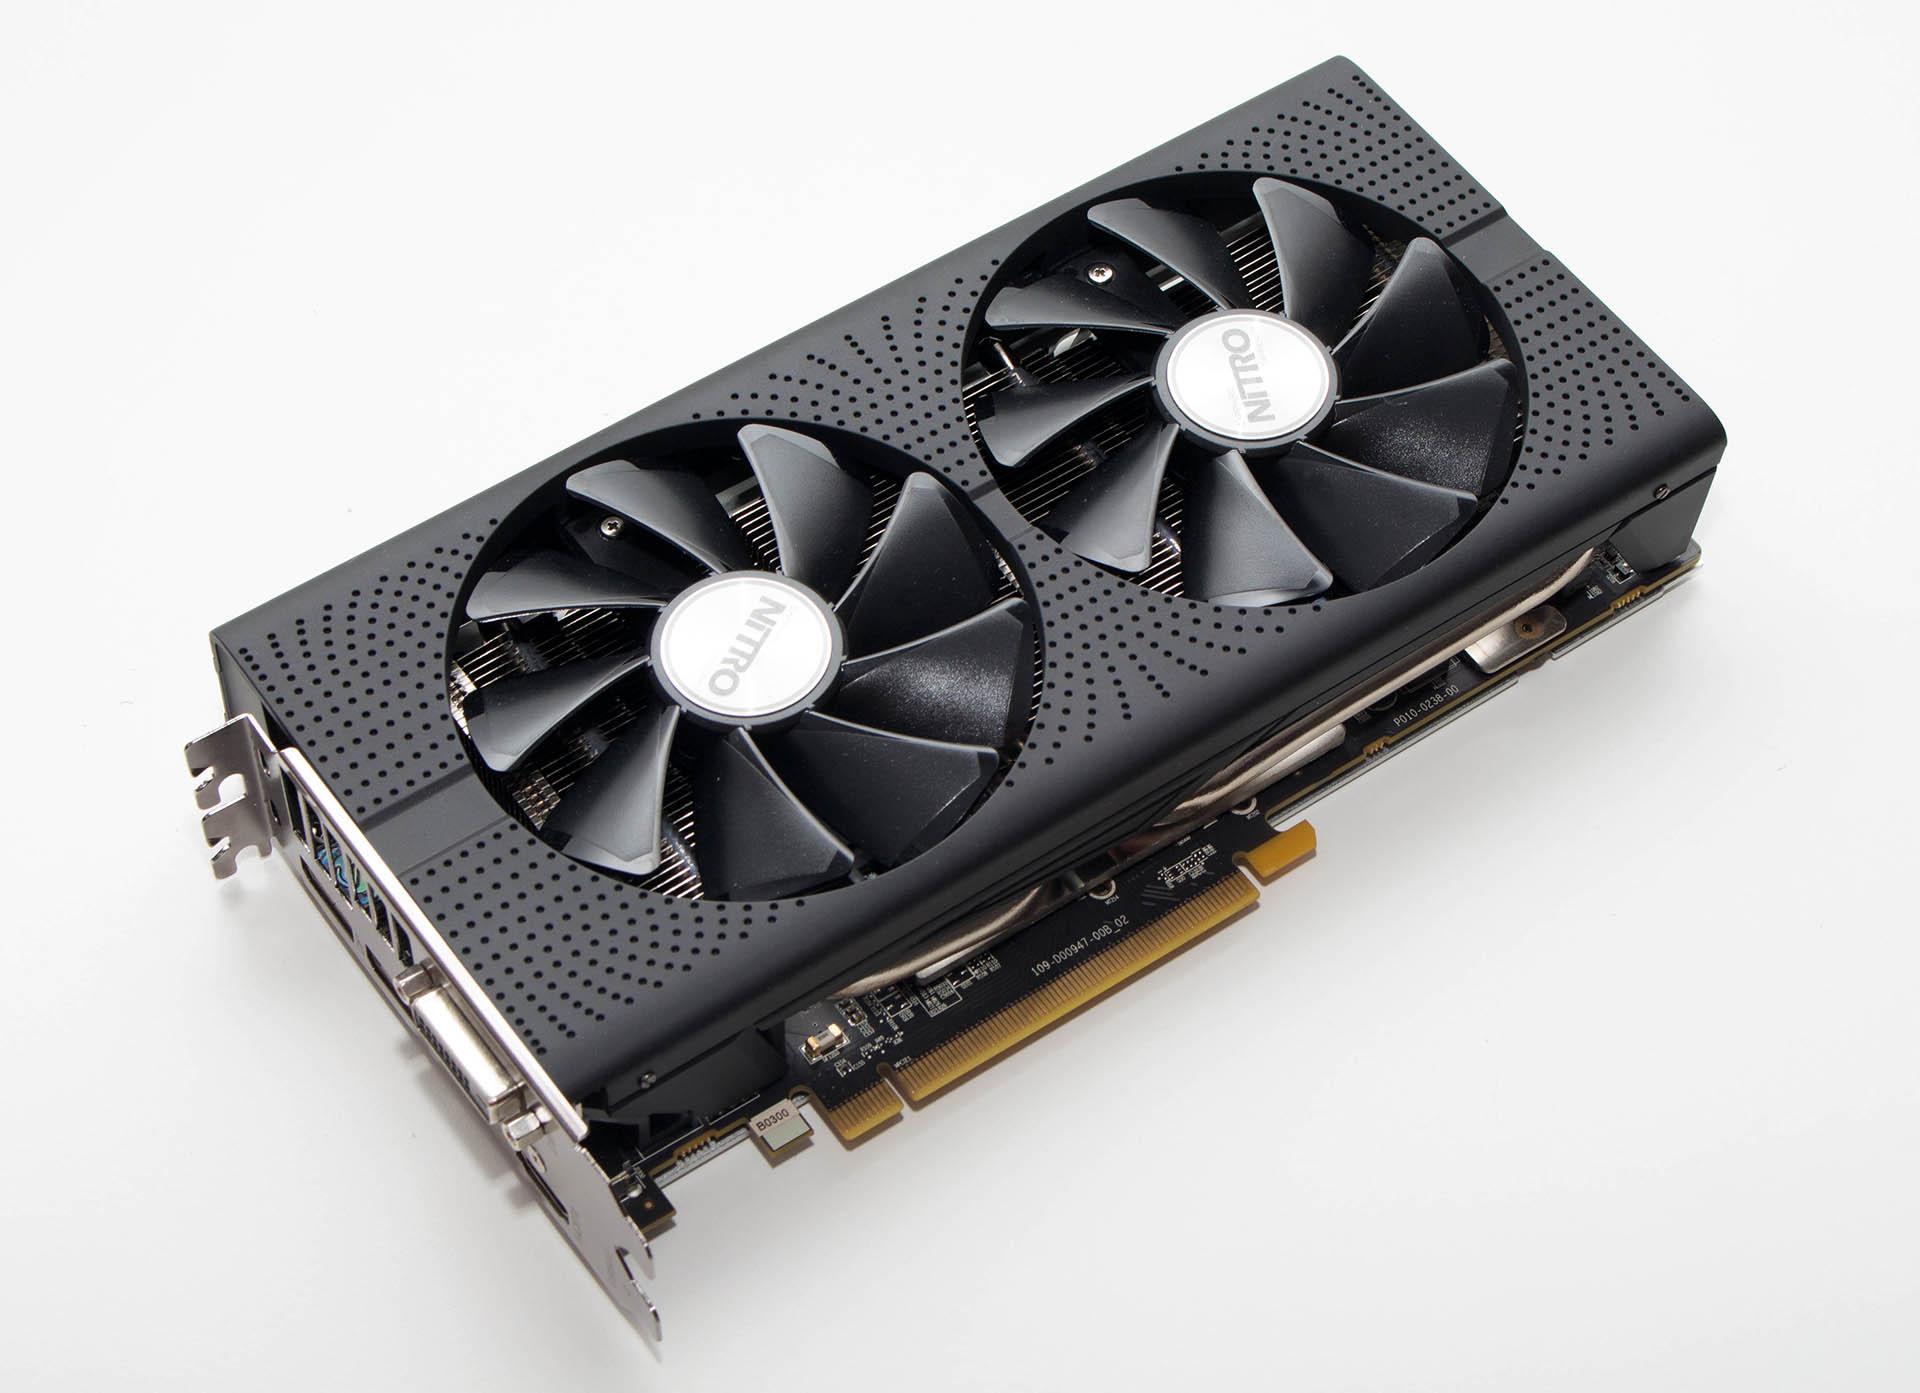 Sapphire Radeon RX470 Nitro+ 4GB test